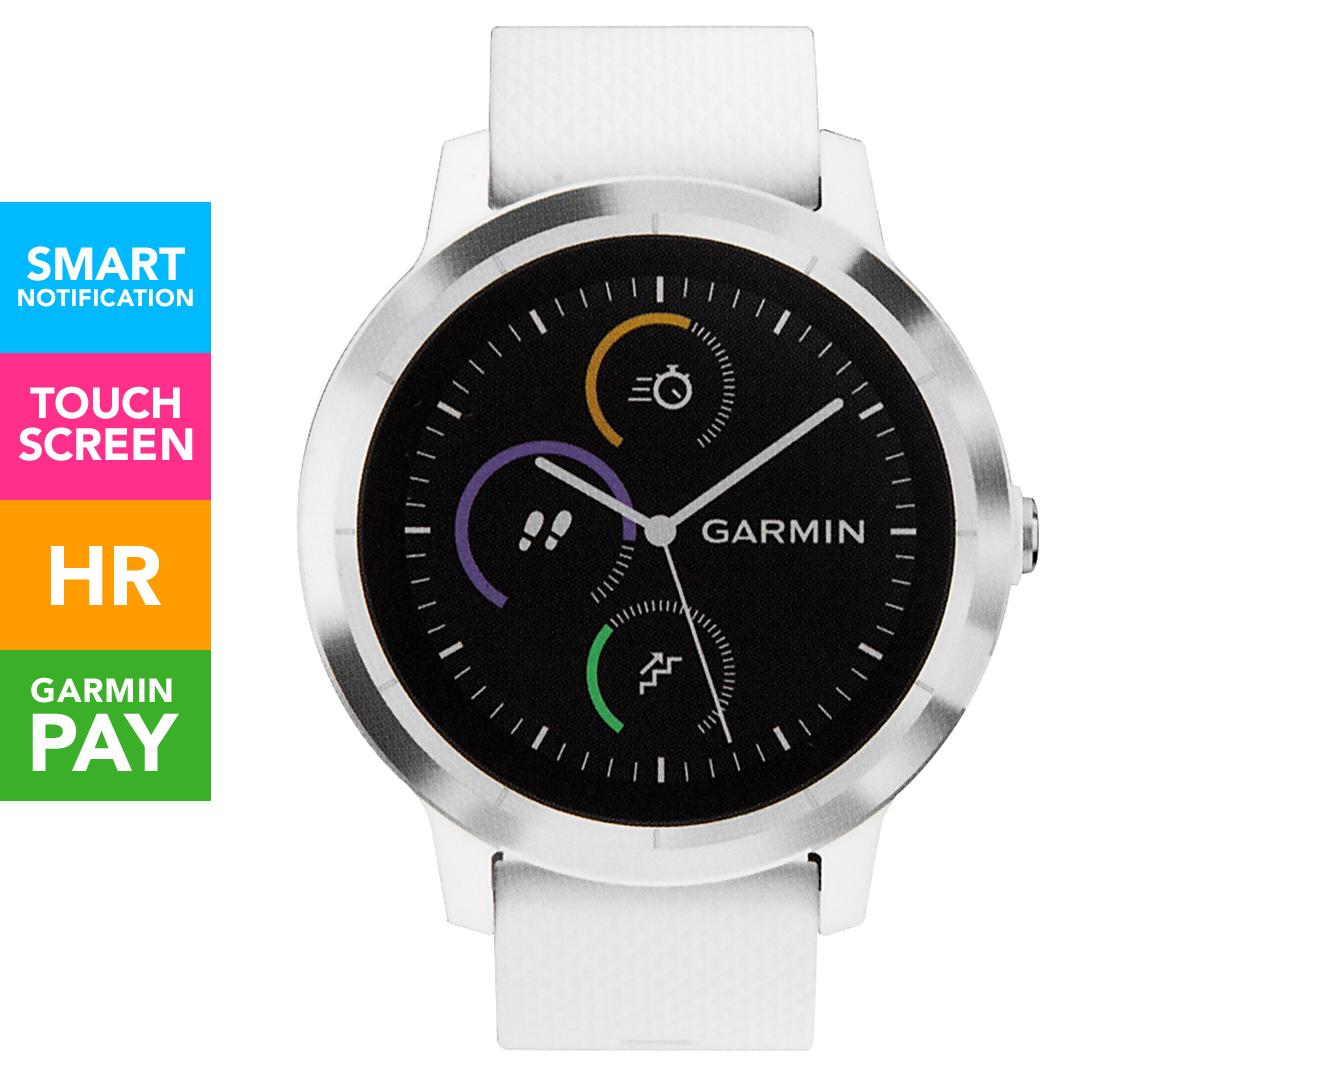 Garmin Vivoactive 3 Smartwatch - White/Stainless Steel